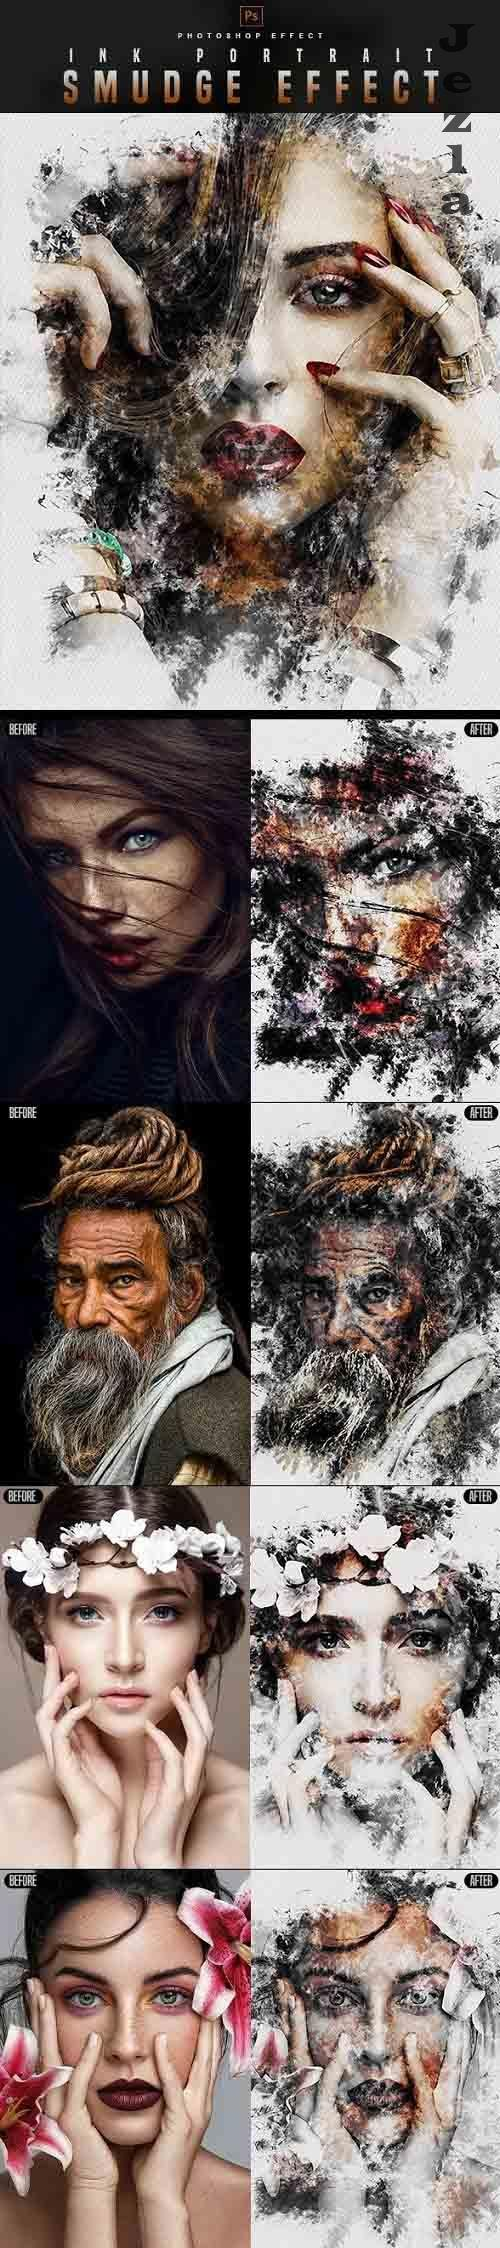 GraphicRiver - Smudge Portrait - PHSP Effect 30177572